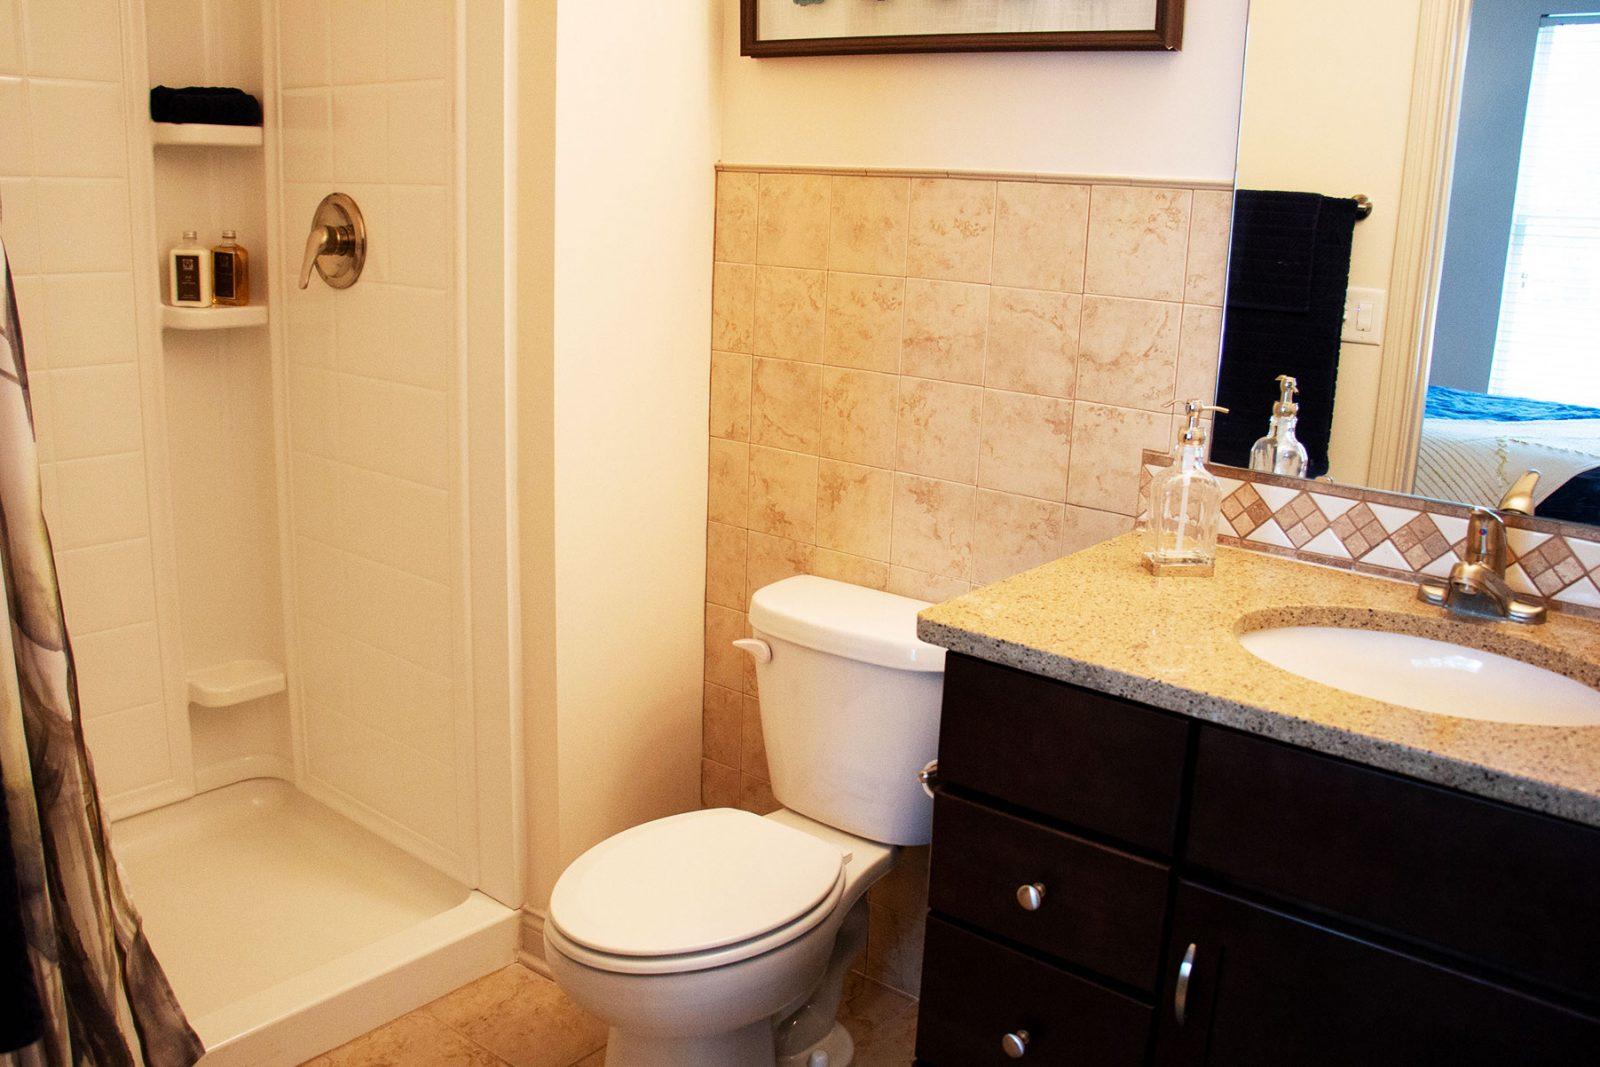 Quartz bathroom countertops, walk in showers and closet